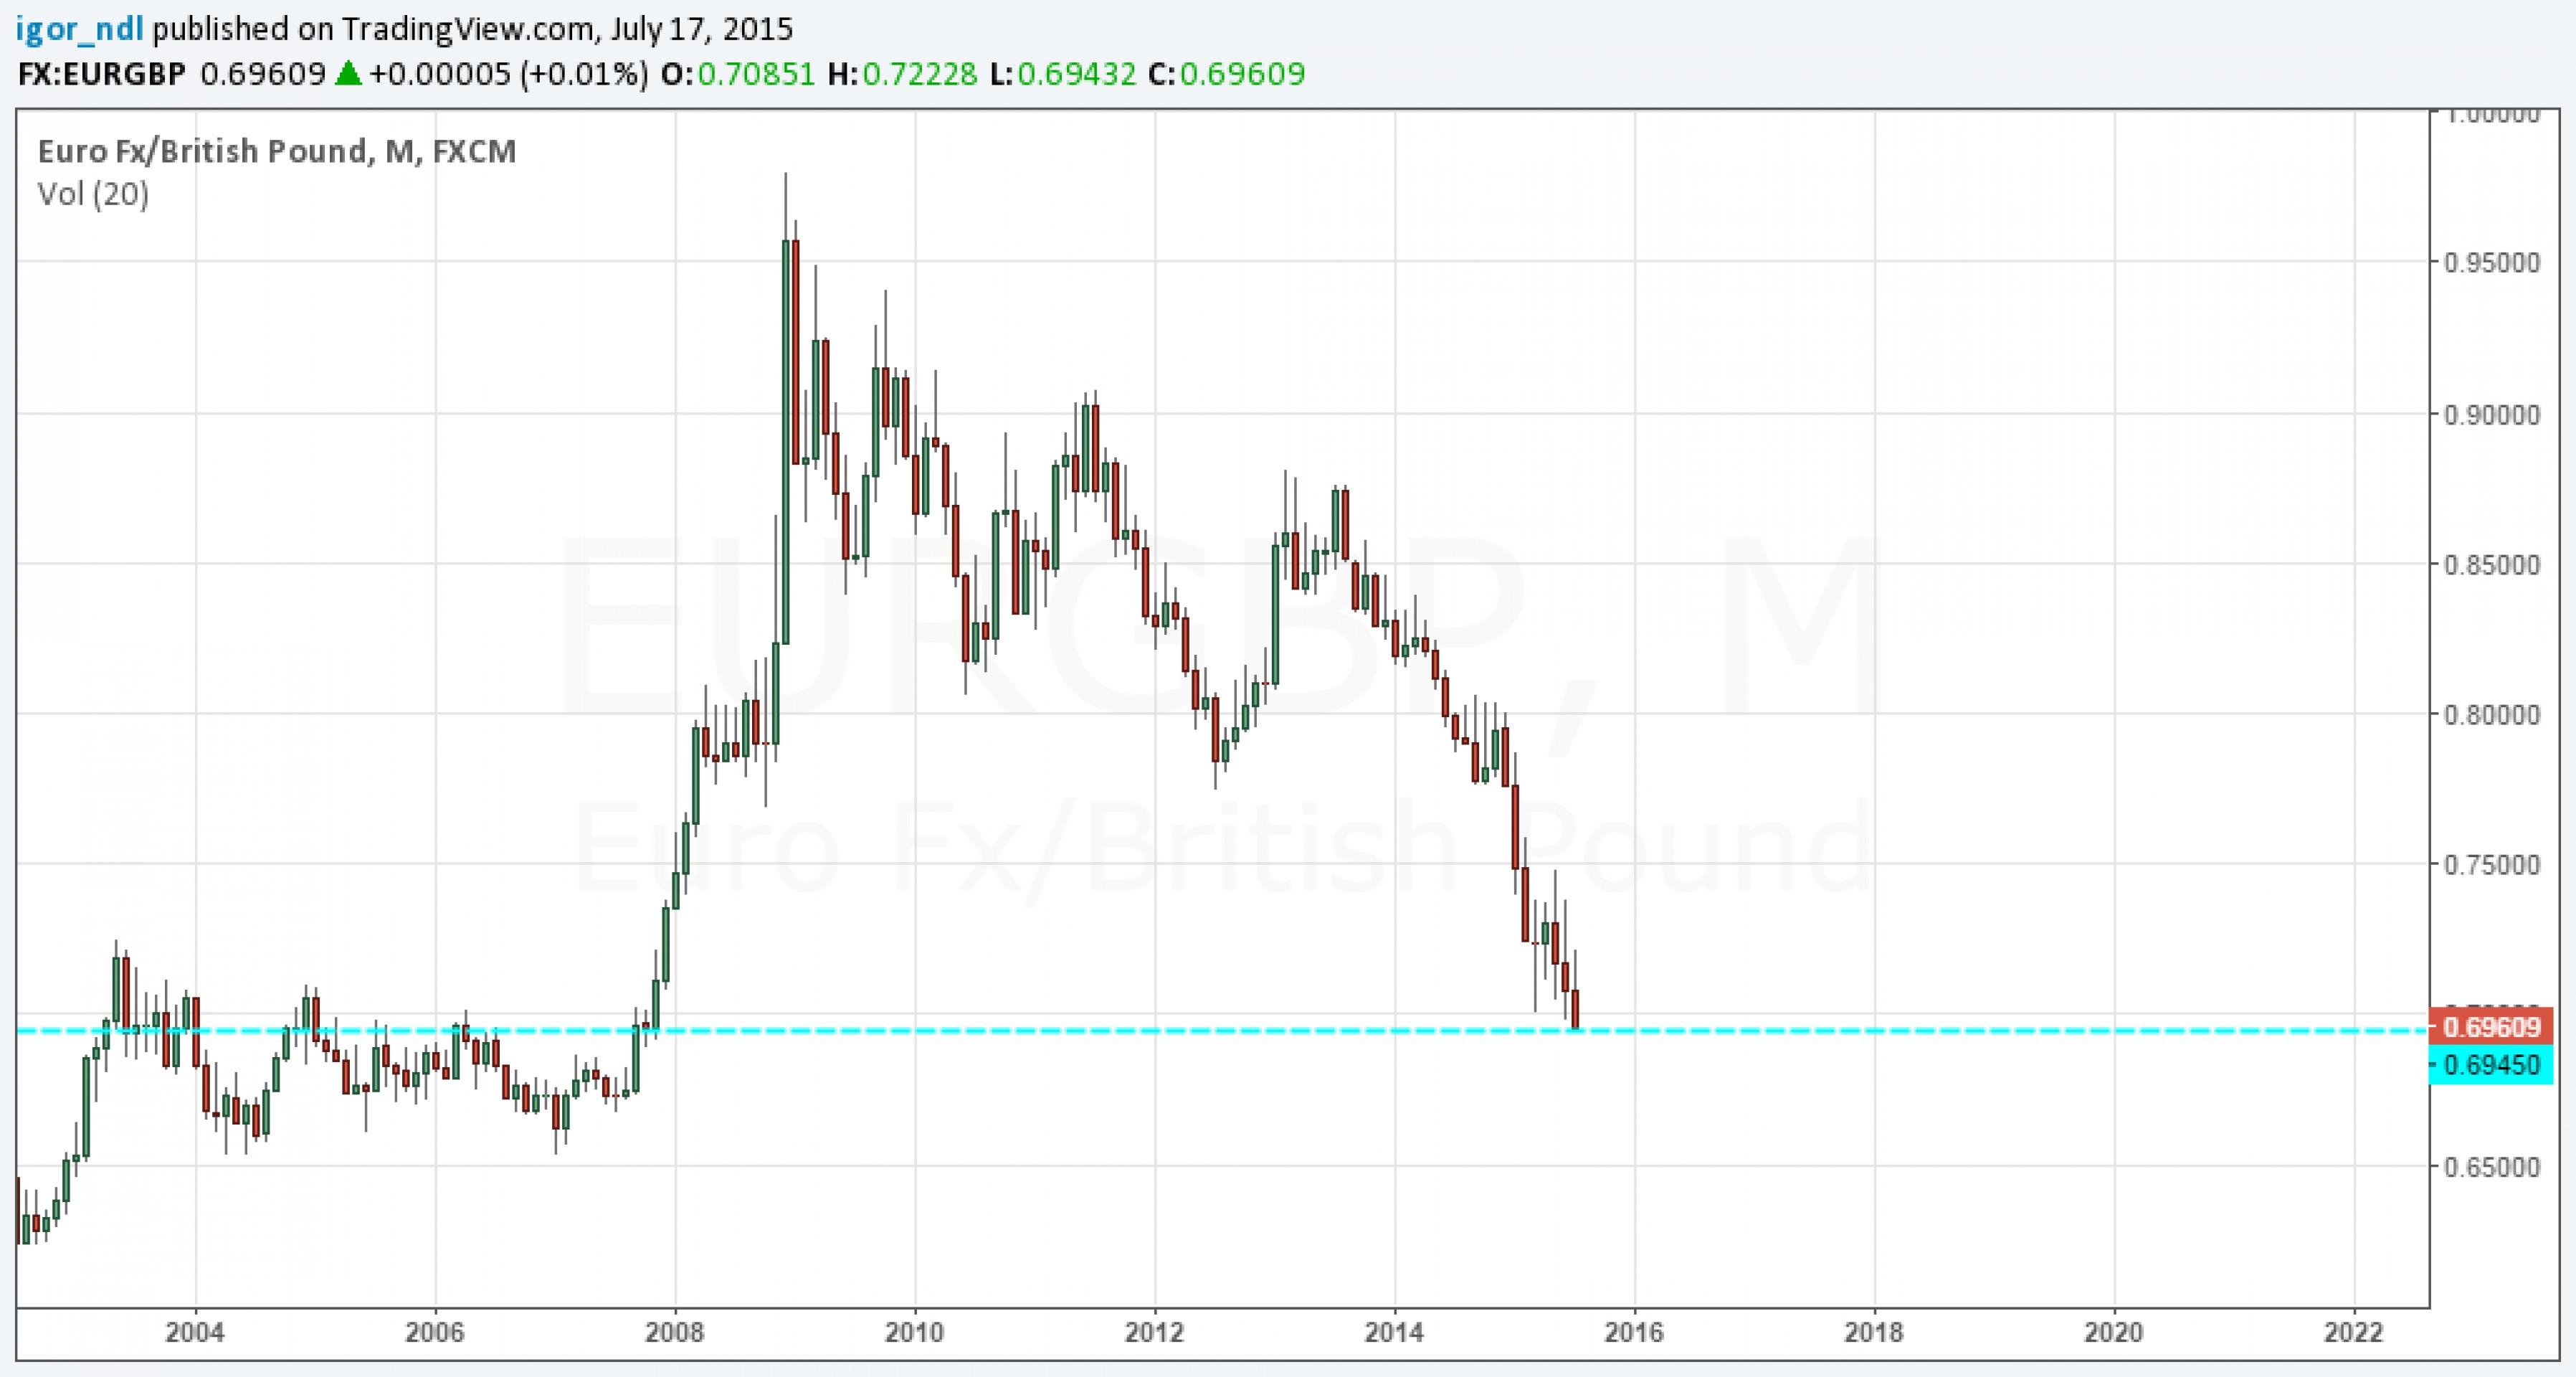 Британский фунт - главный бенефициар проблем евро